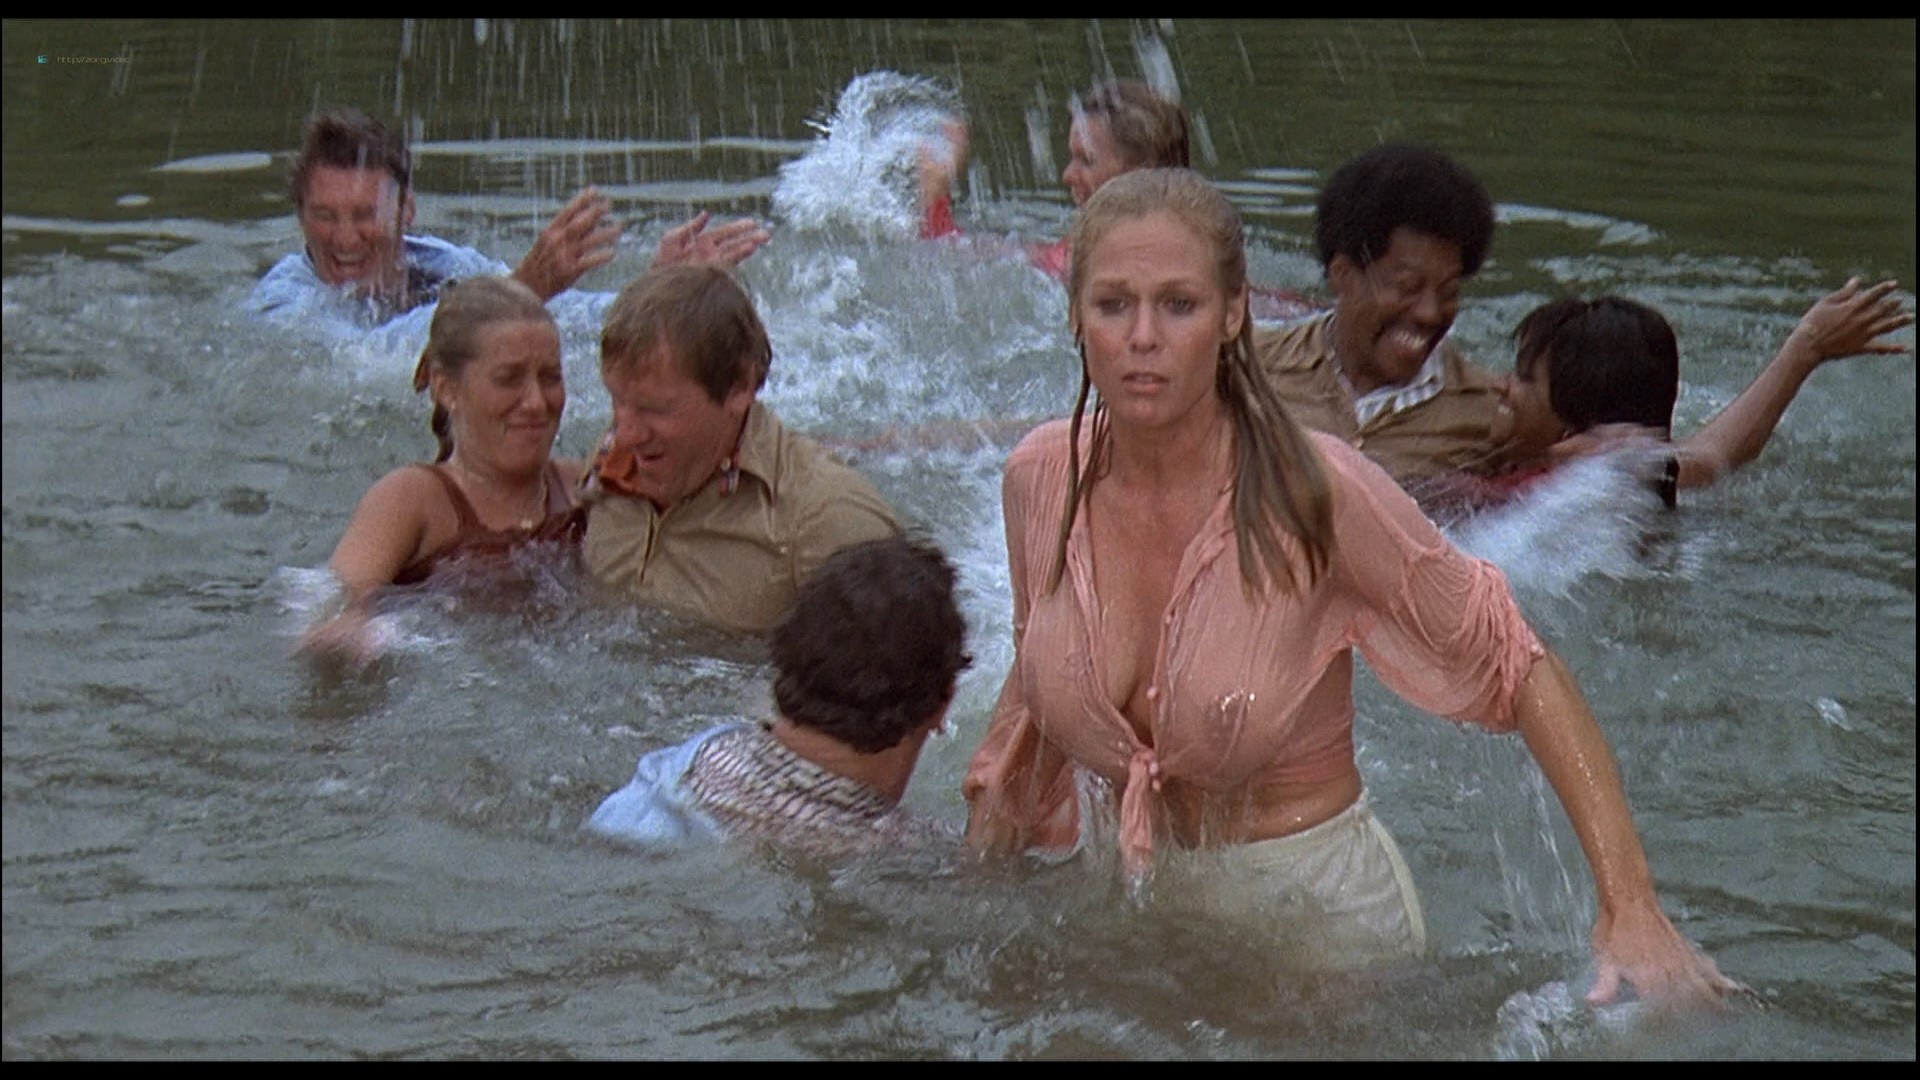 Cheré Bryson busty see through Andrea Howard, Pamela Hensley hot - The Nude Bomb (1980) HD 1080p BluRay (5)